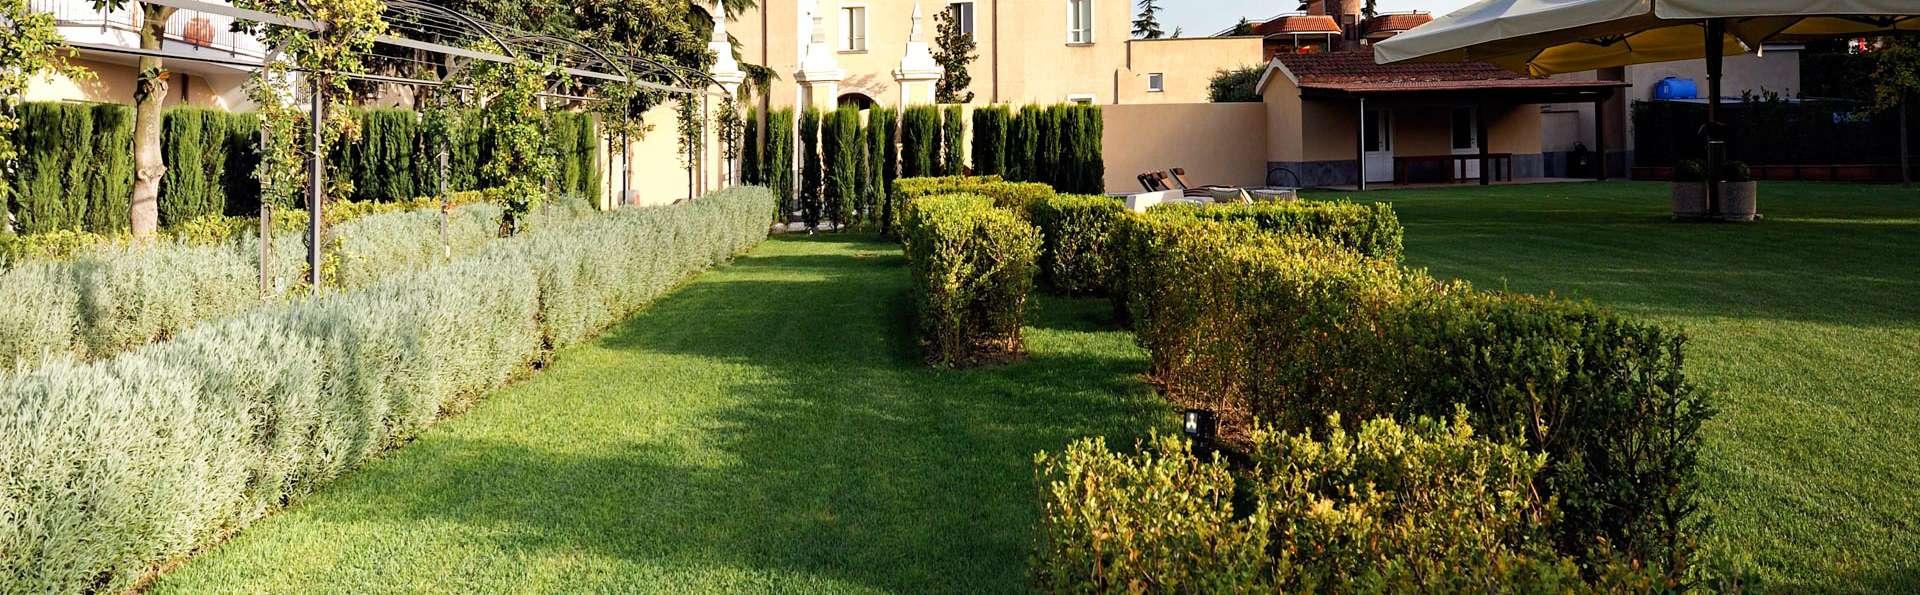 Relais Villa Buonanno - EDIT_EXTERIOR_03.jpg